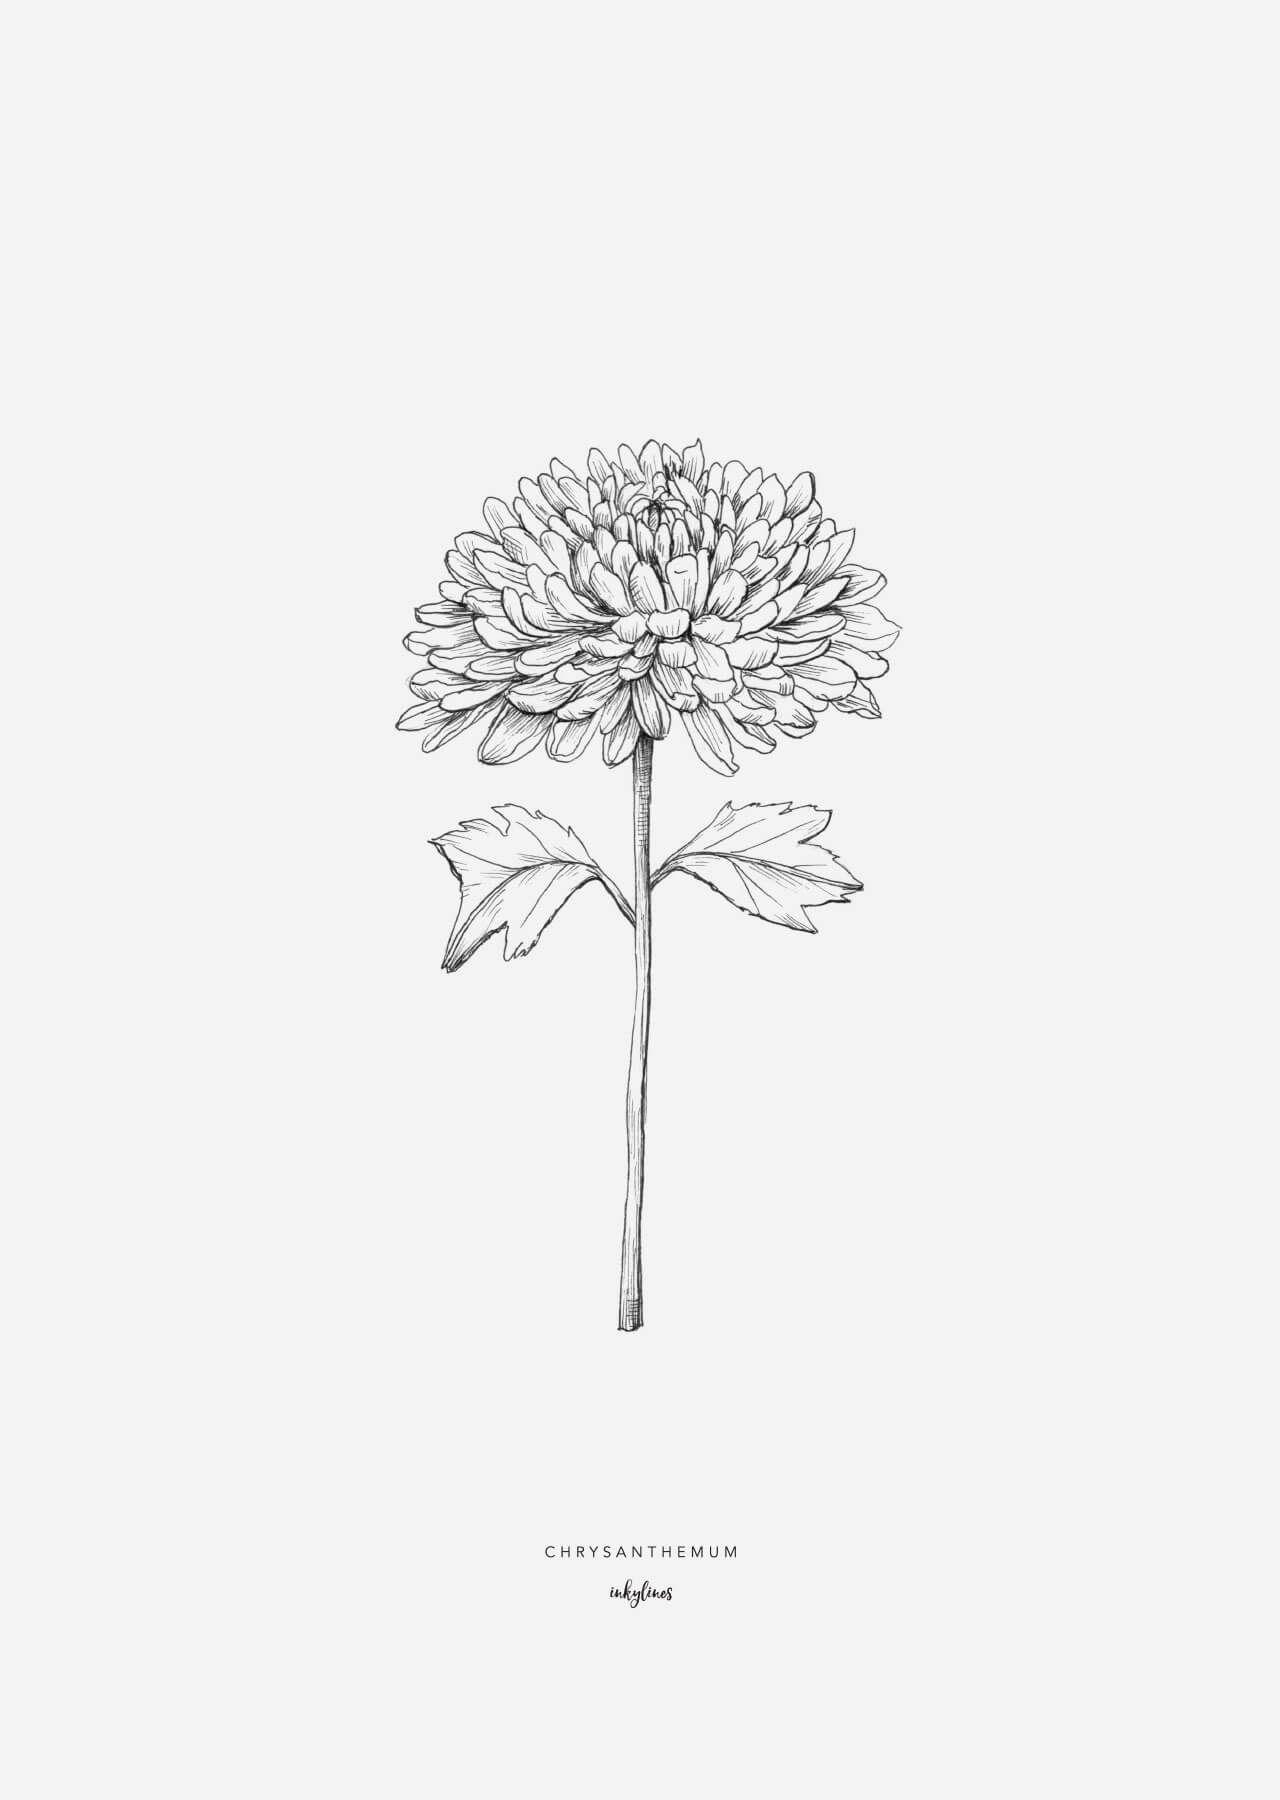 Printables Chrysanthemum Chrysanthemum Tattoo Birth Flower Tattoos Chrysanthemum Flower Tattoo